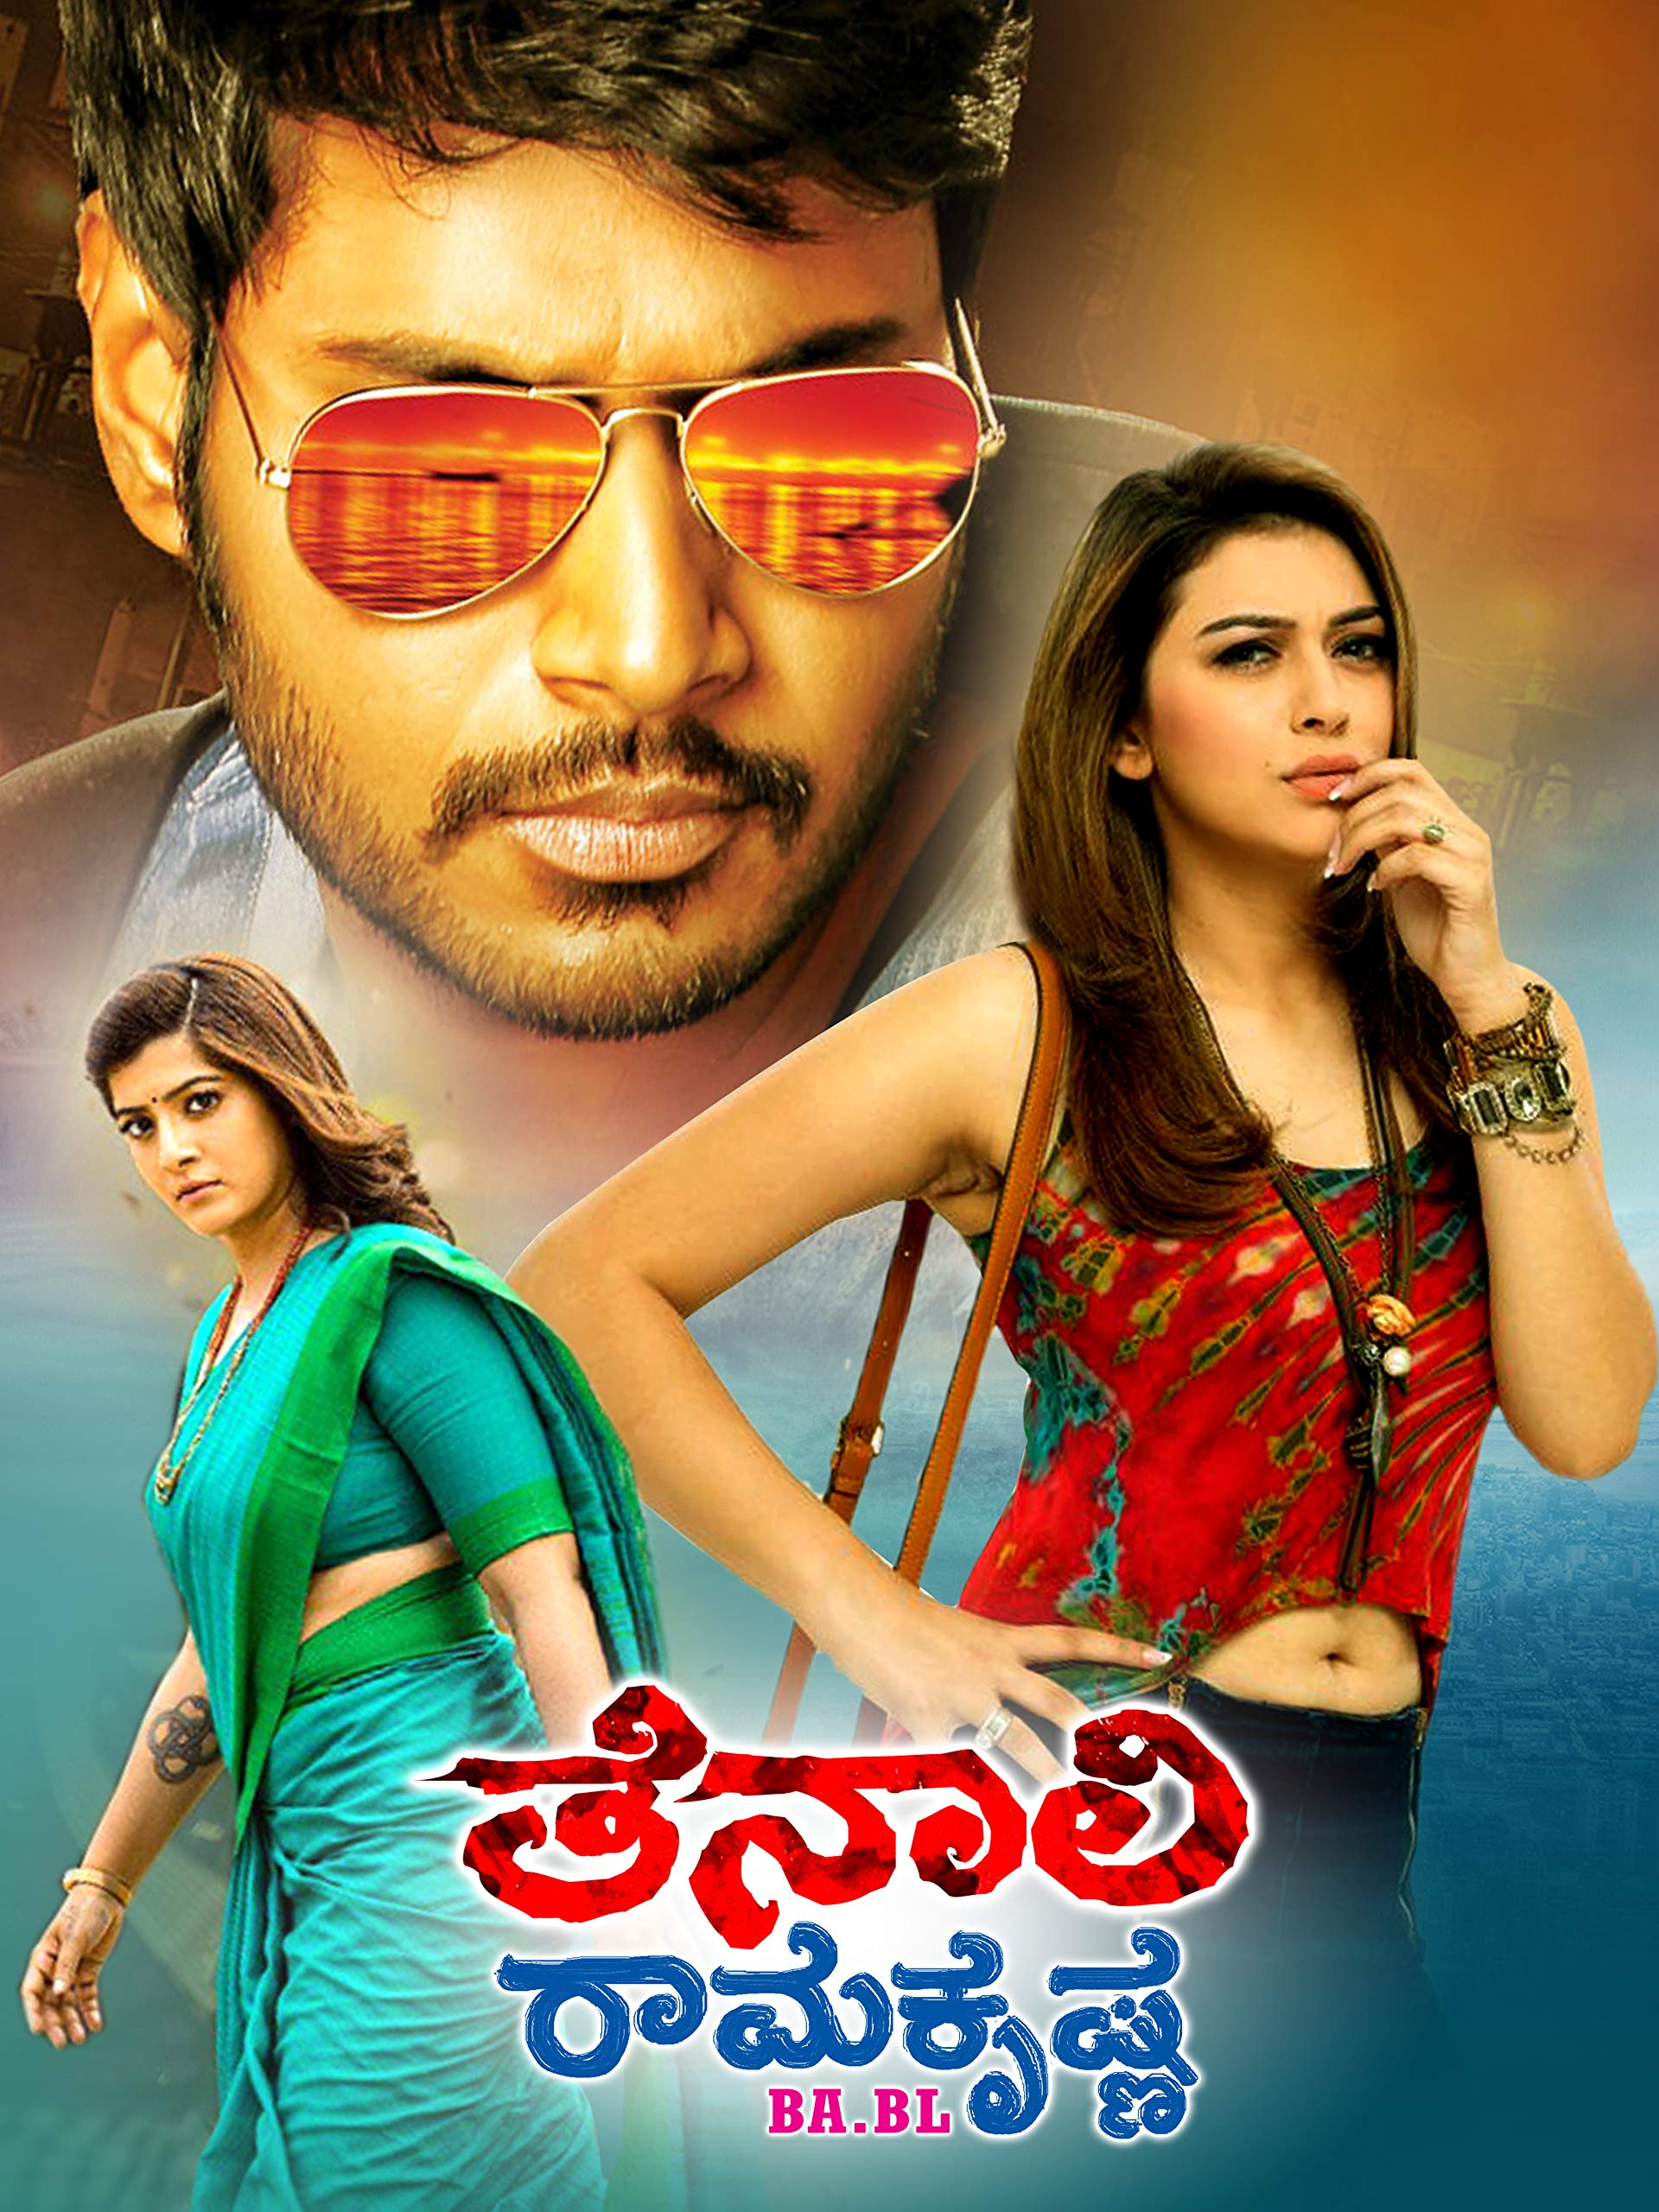 Tenali Ramakrishna BA.BL (2019) UNCUT Dual Audio Hindi ORG 720p HDRip x264 AAC 900MB Download